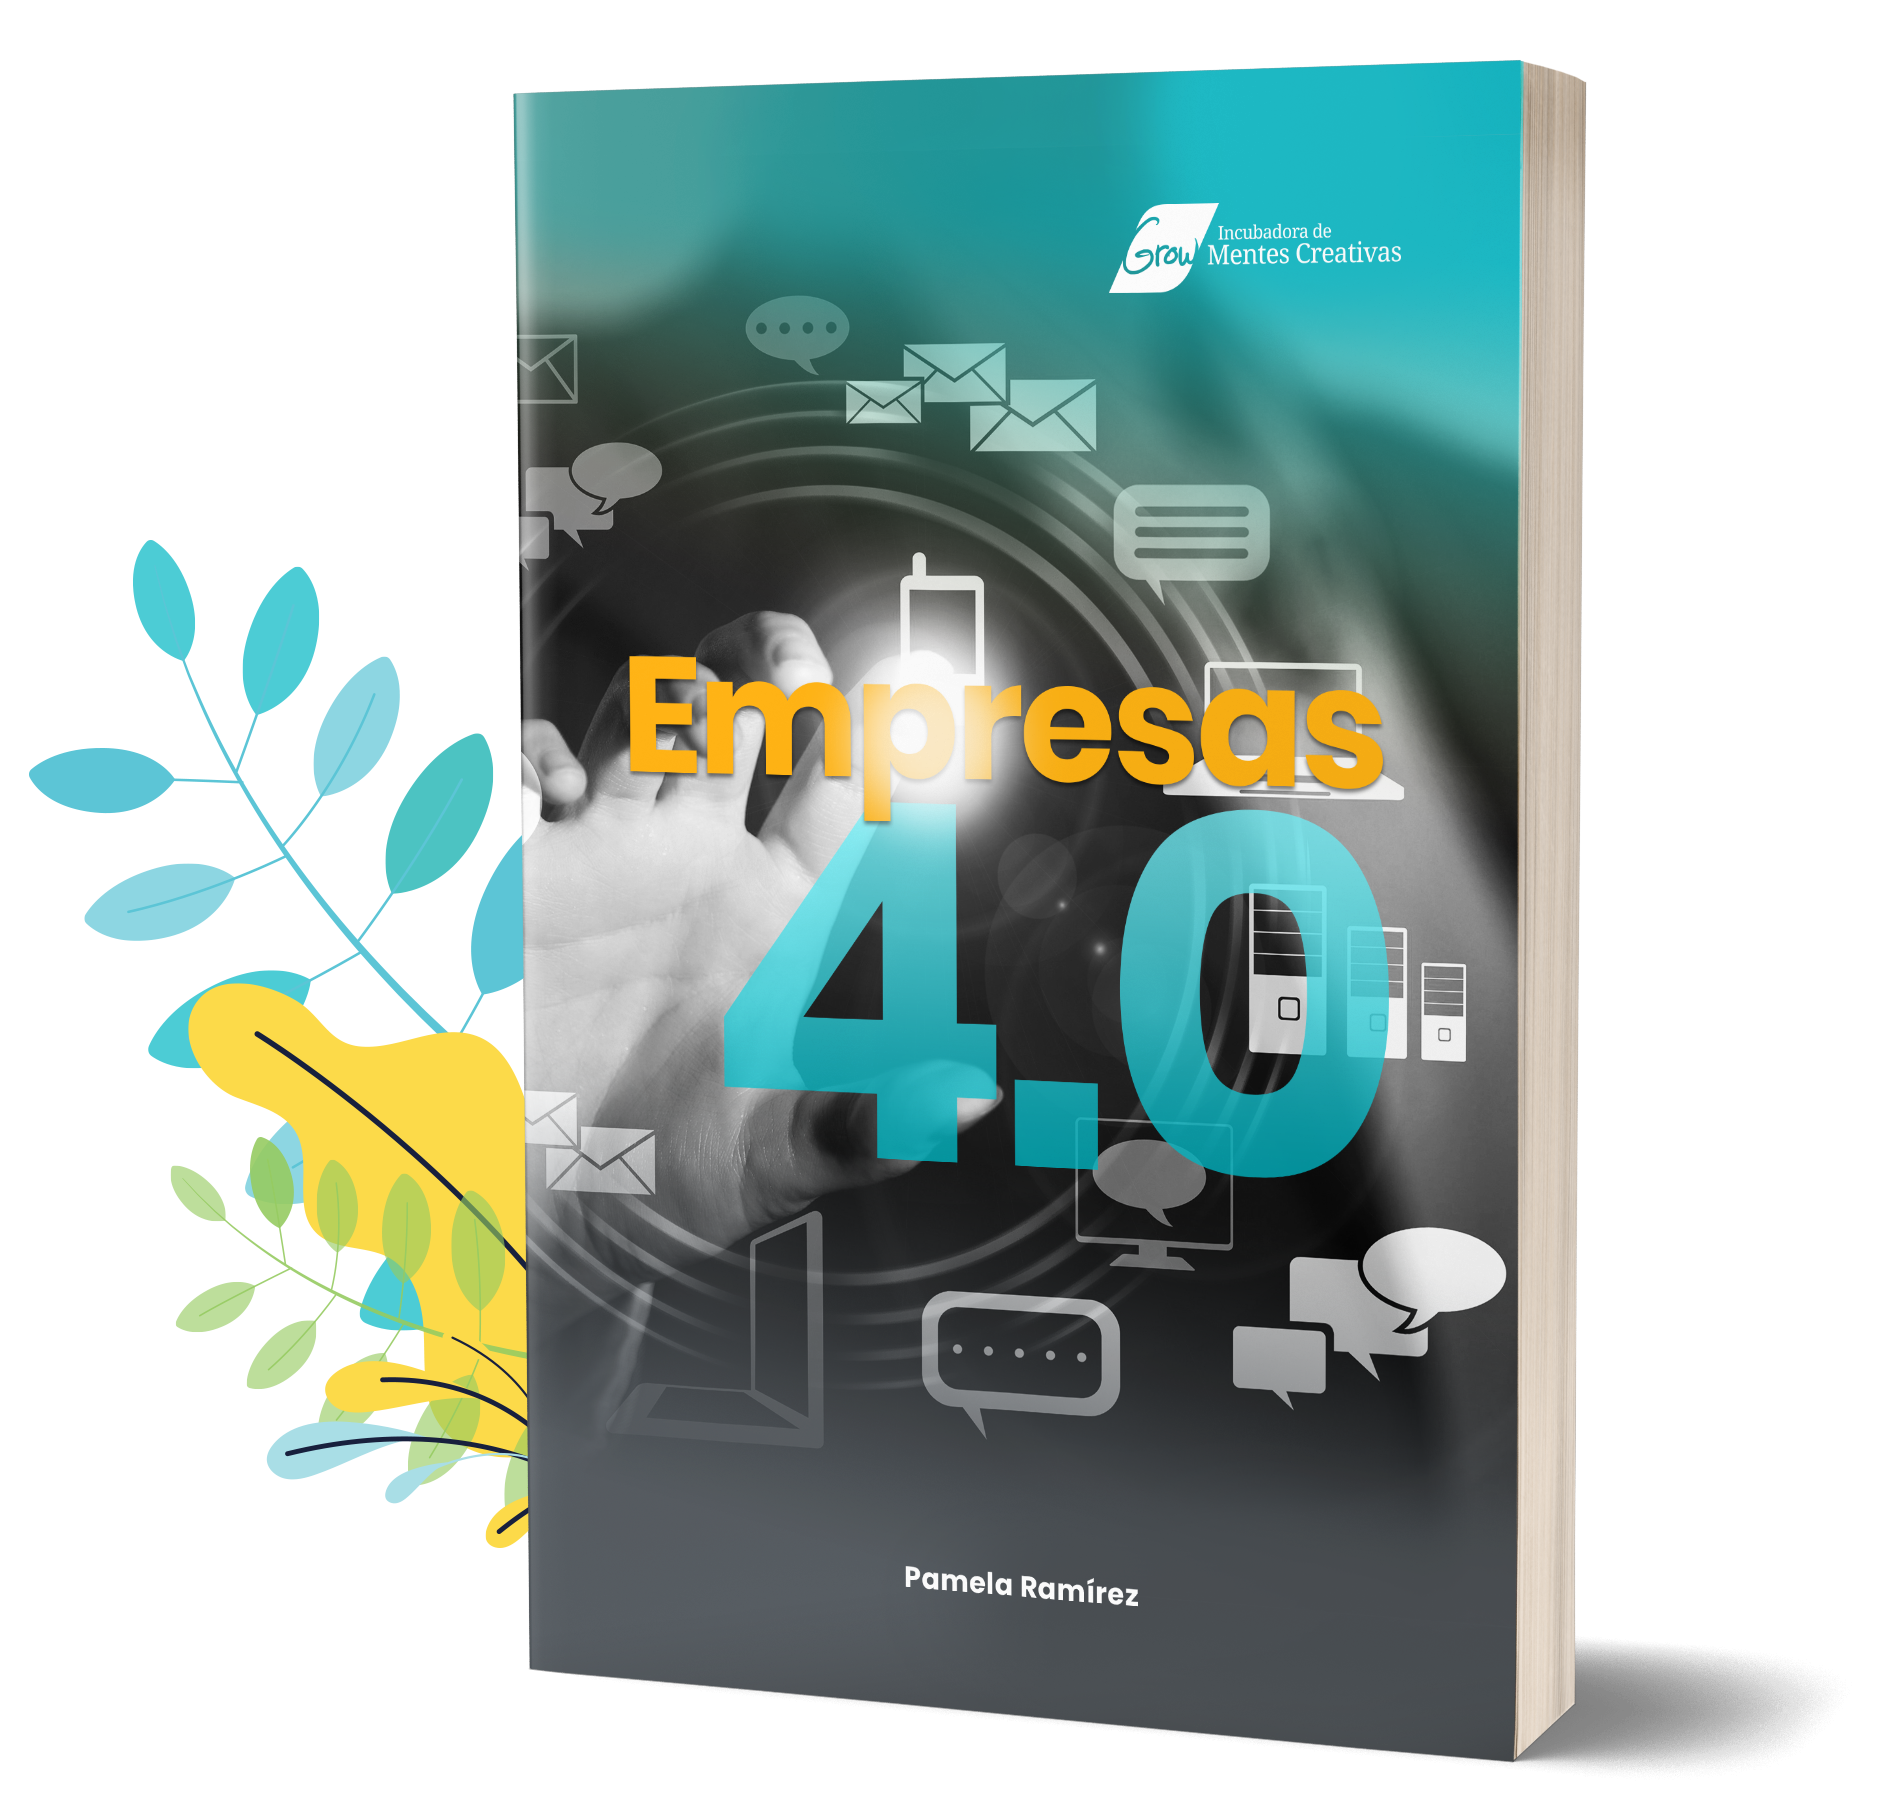 grow-mockup-ebook-empresas40-04